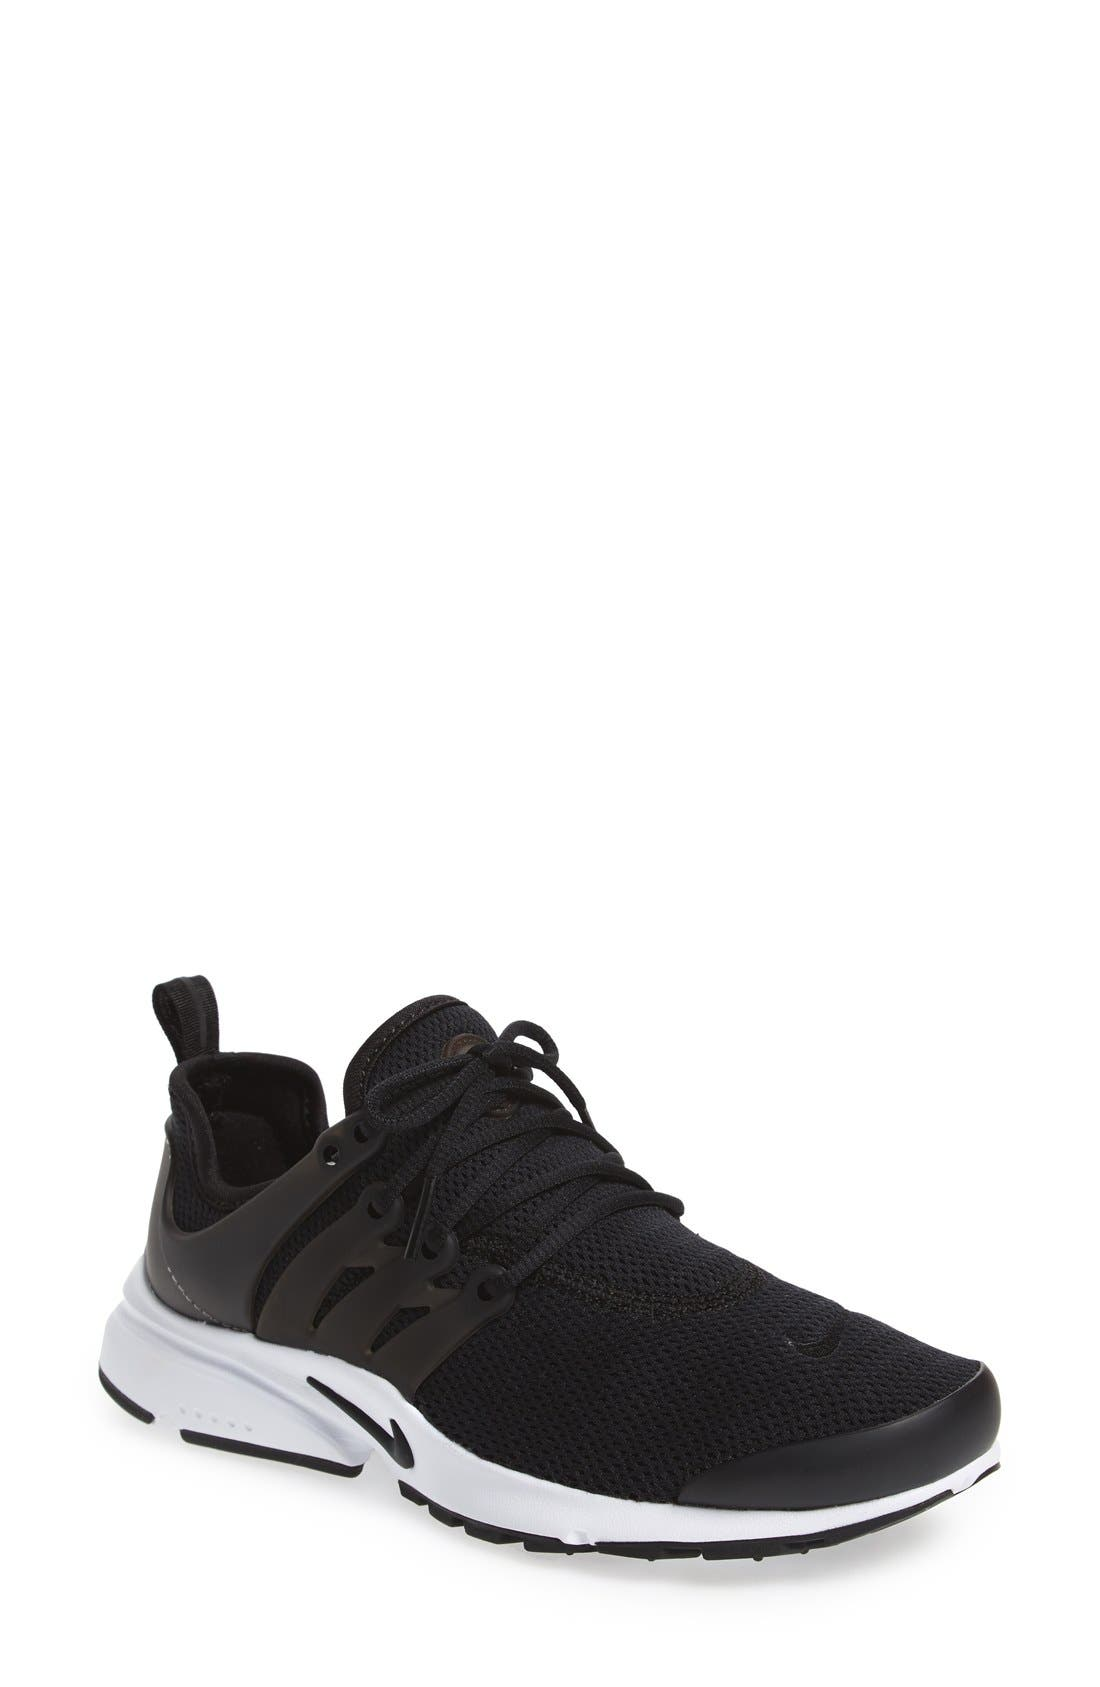 Alternate Image 1 Selected - Nike Air Presto Sneaker (Women)